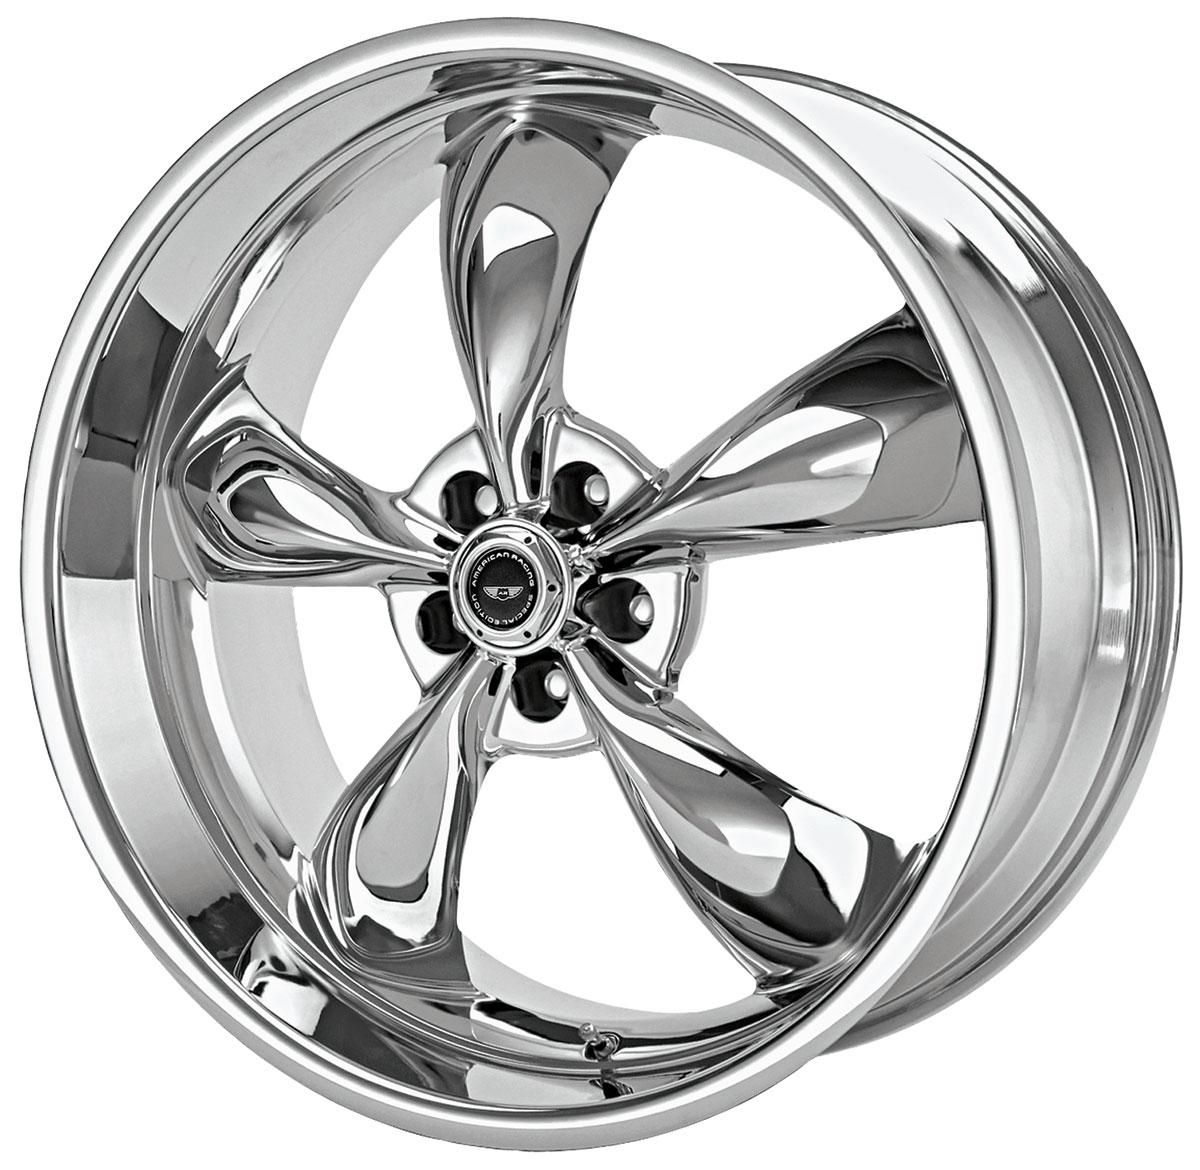 Wheel, American Racing, AR605 Torq Thrust M, 2003-2019 CAD, 17x7.5